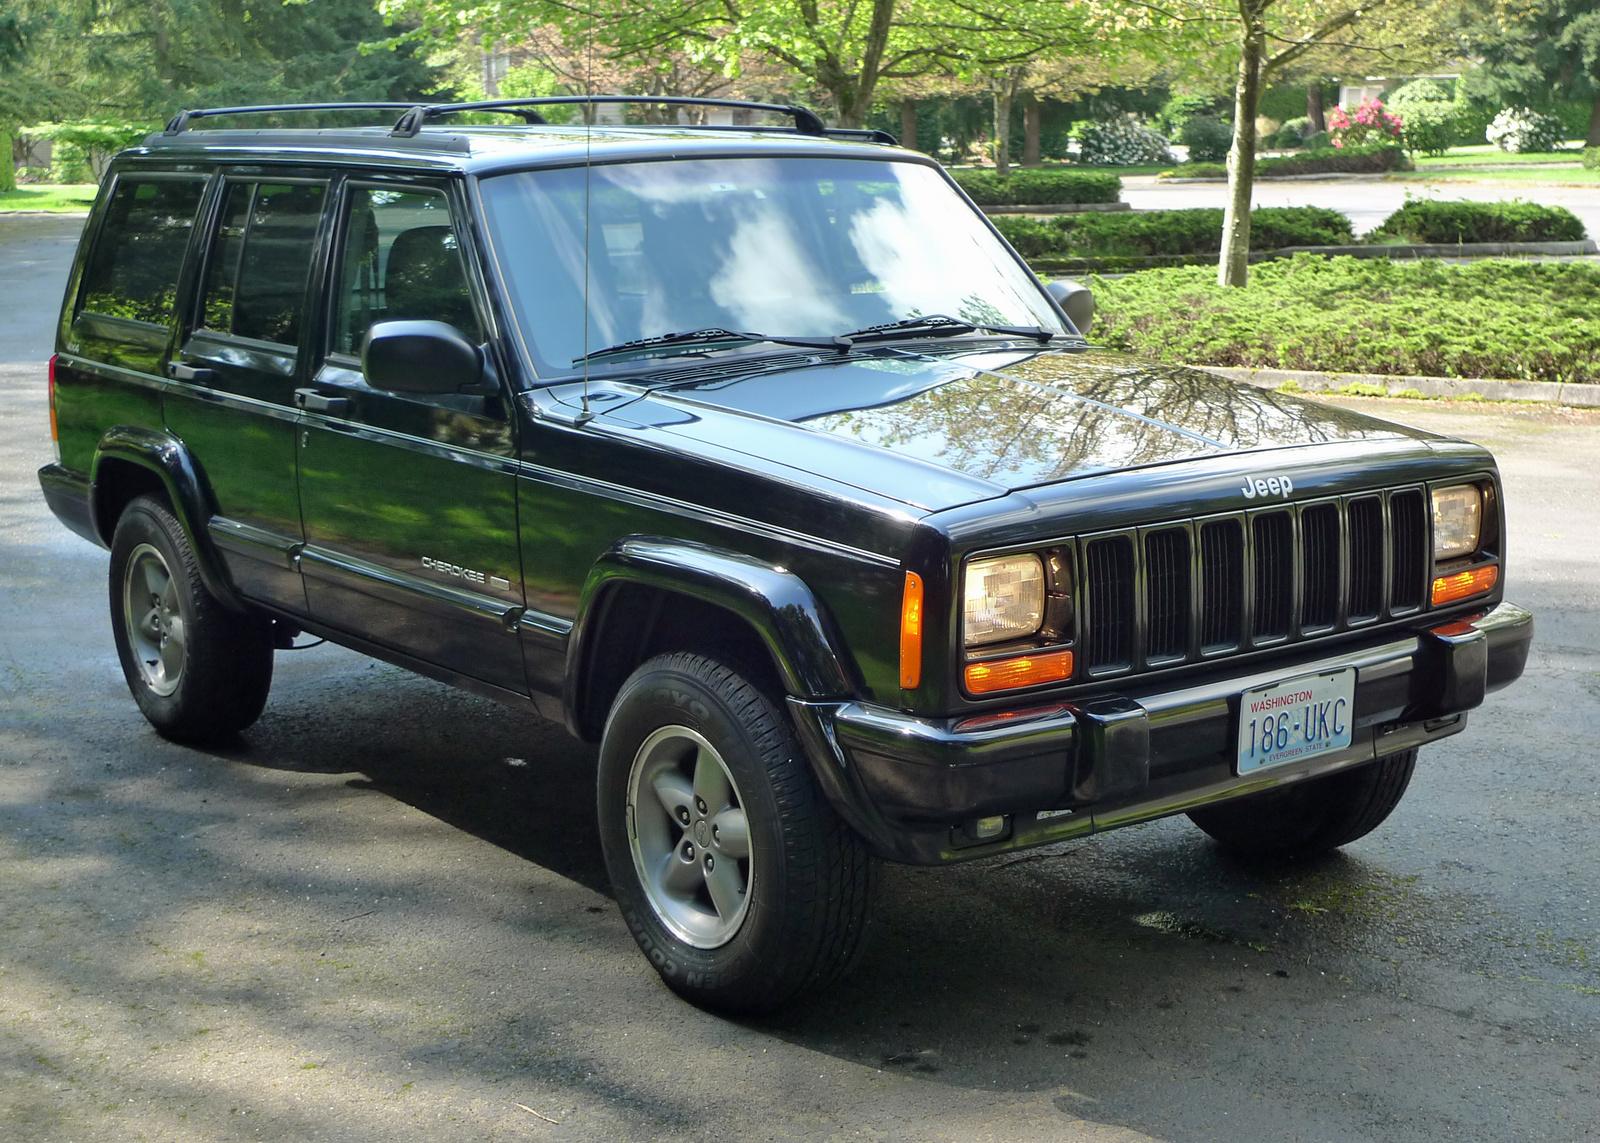 1981 jeep wagoneer pictures cargurus - 2015 Jeep Cherokee Review Cargurus